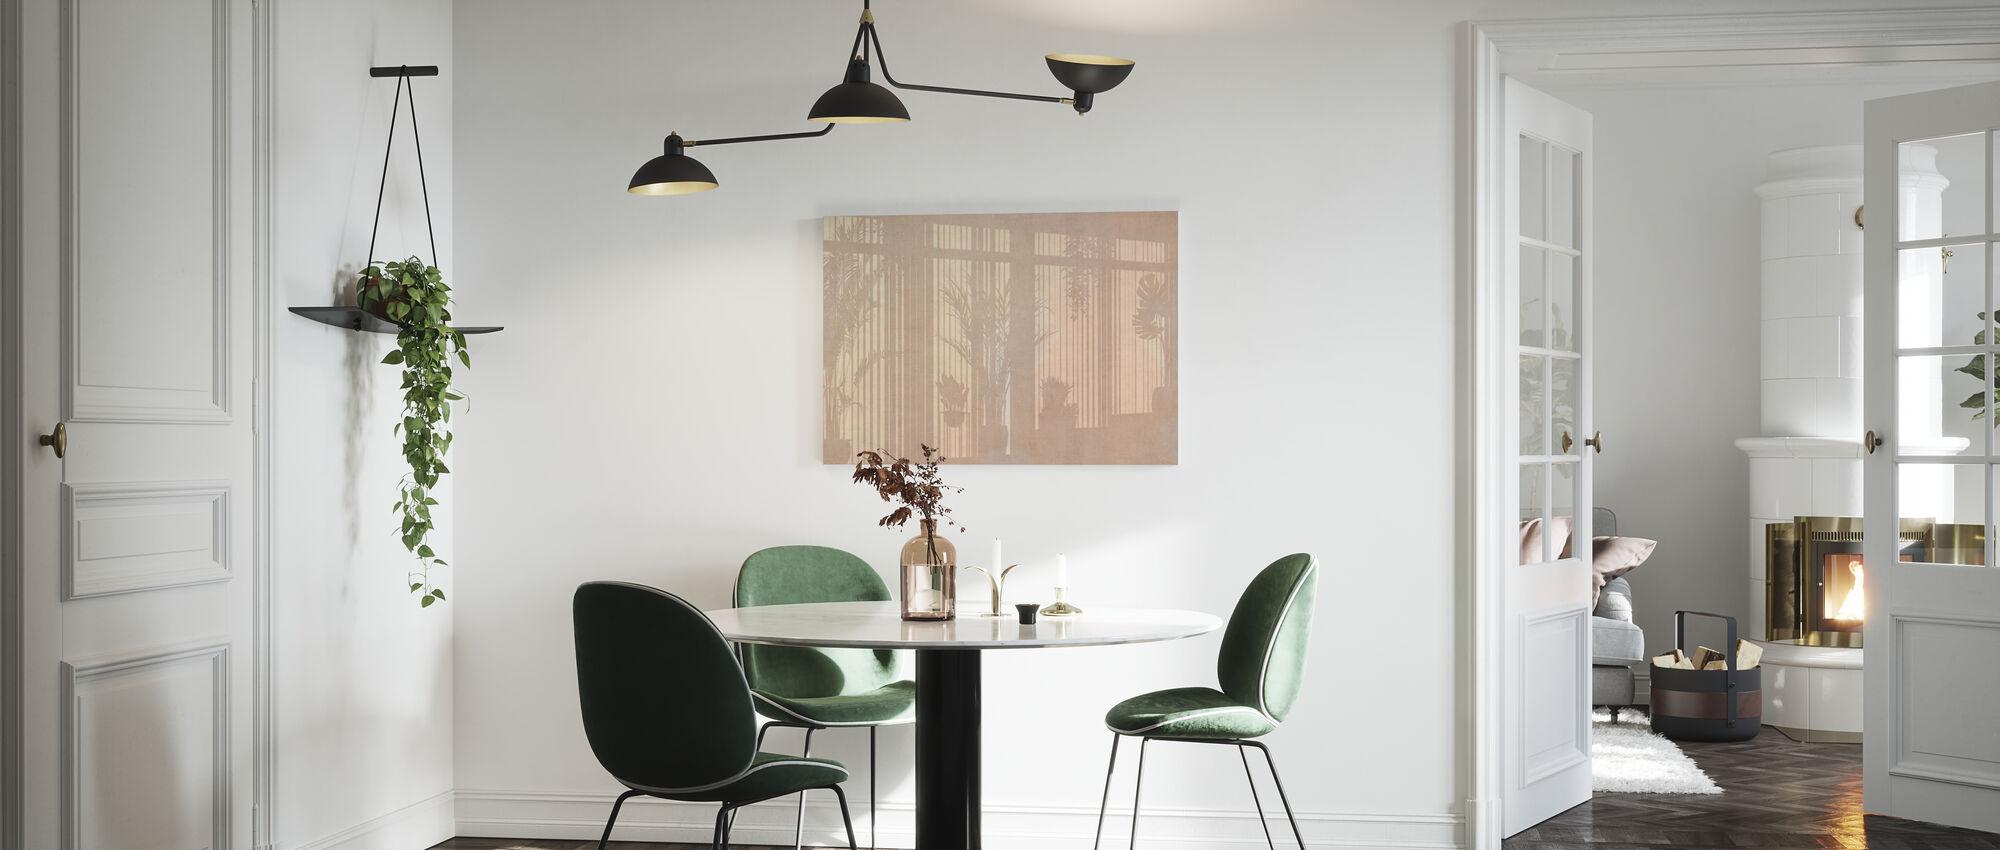 Sunny Window - Ochre - Canvas print - Kitchen